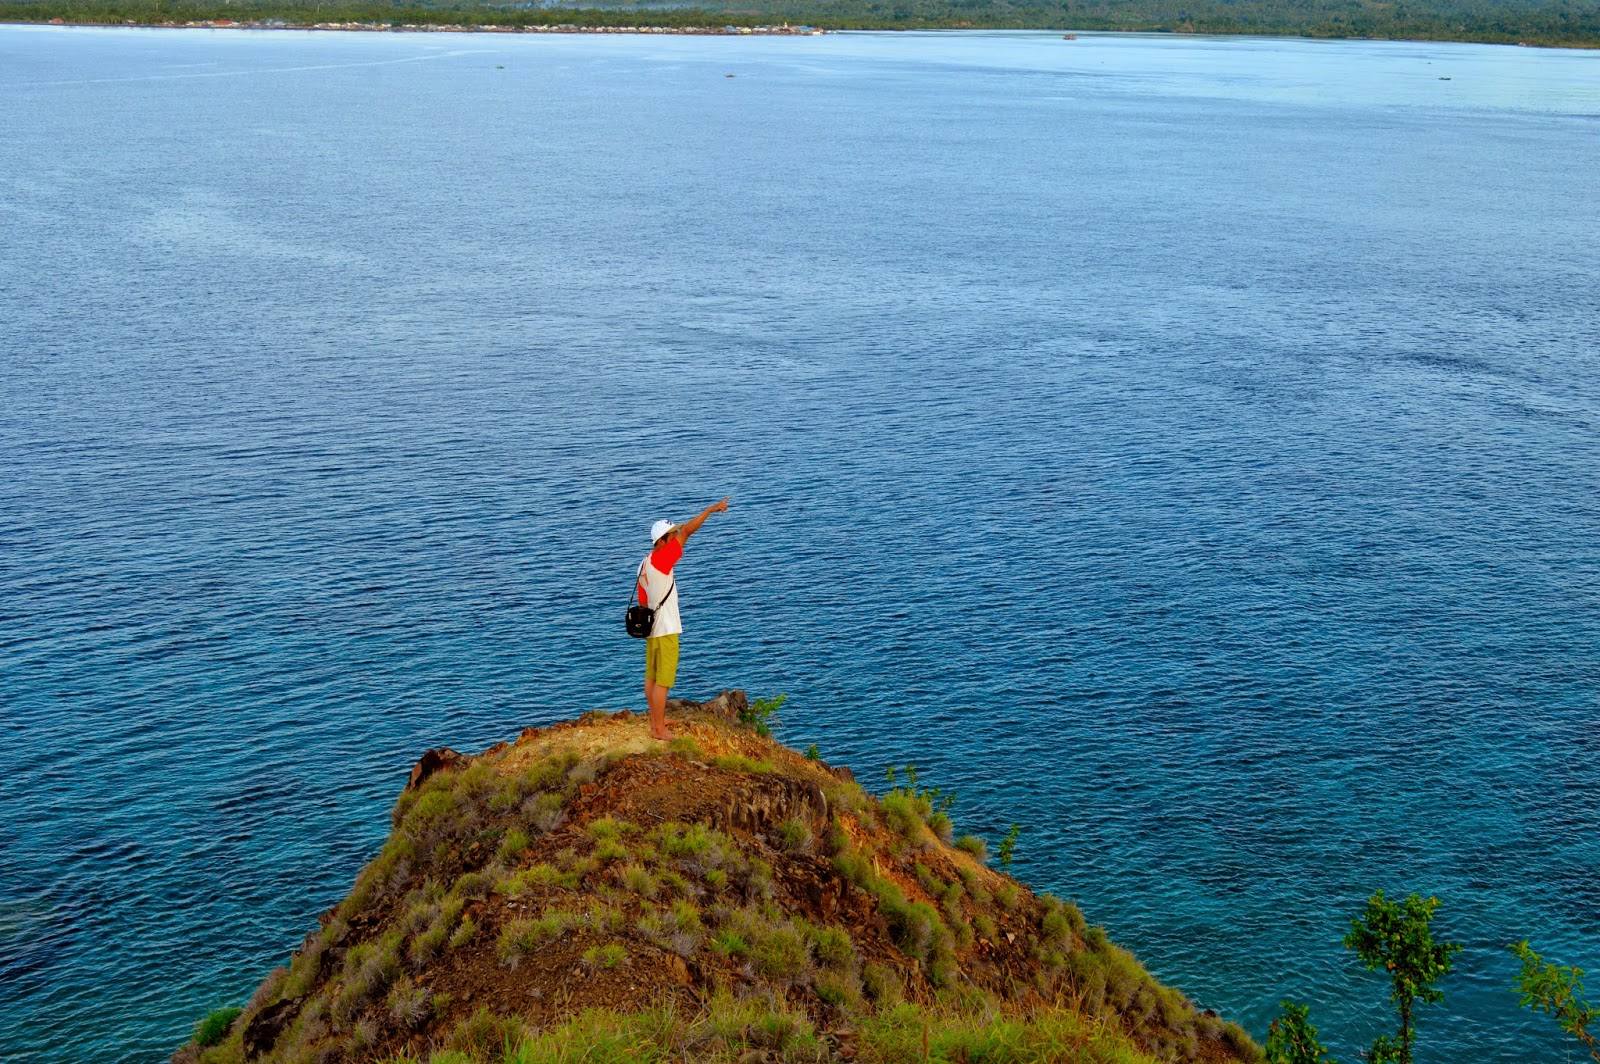 Indahnya Pulau Baling Poteng Qobul Taman Laut Tumbak Kab Minahasa